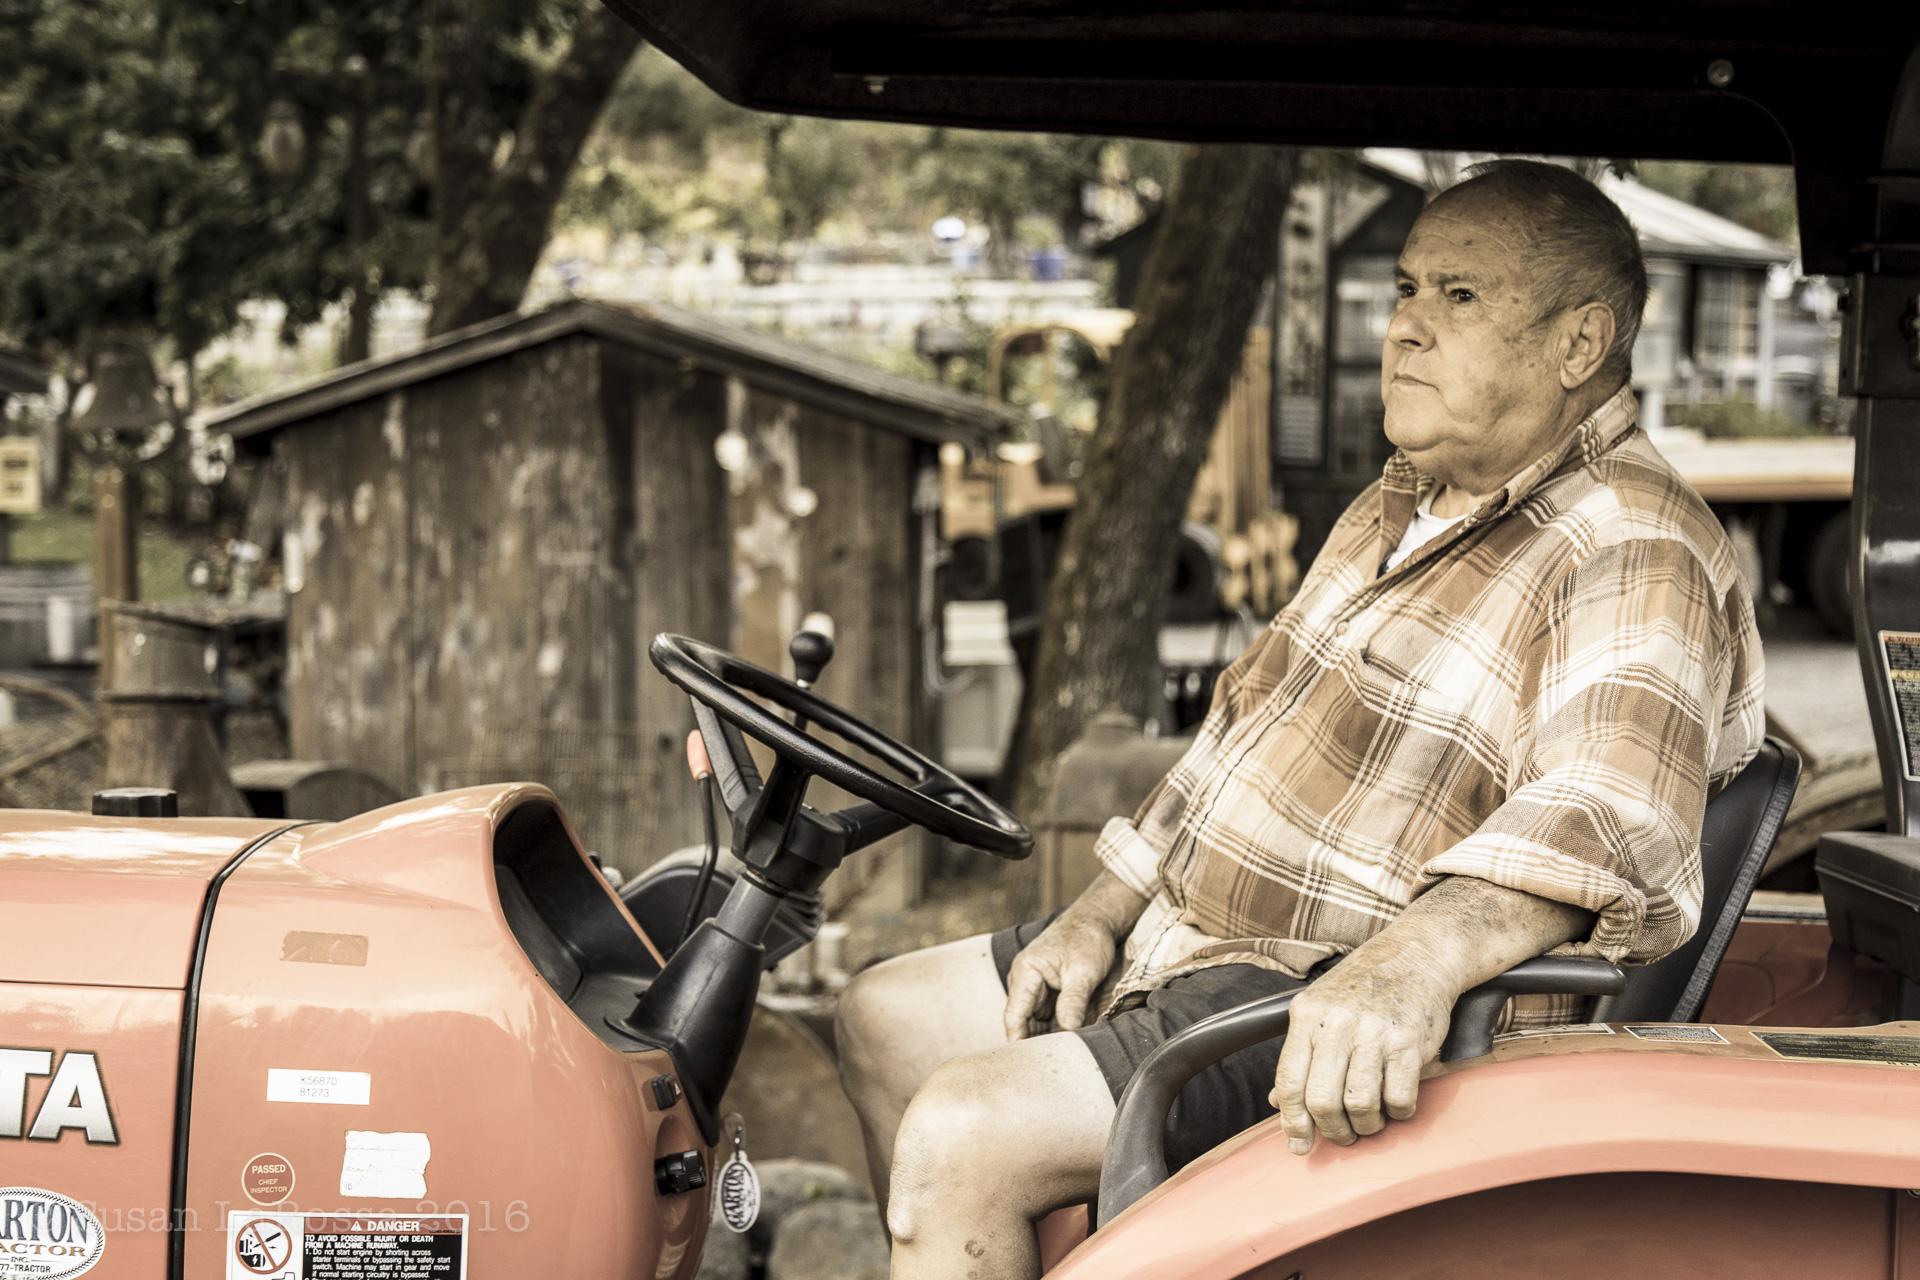 Steve Castelli, grape grower, Russian River Valley